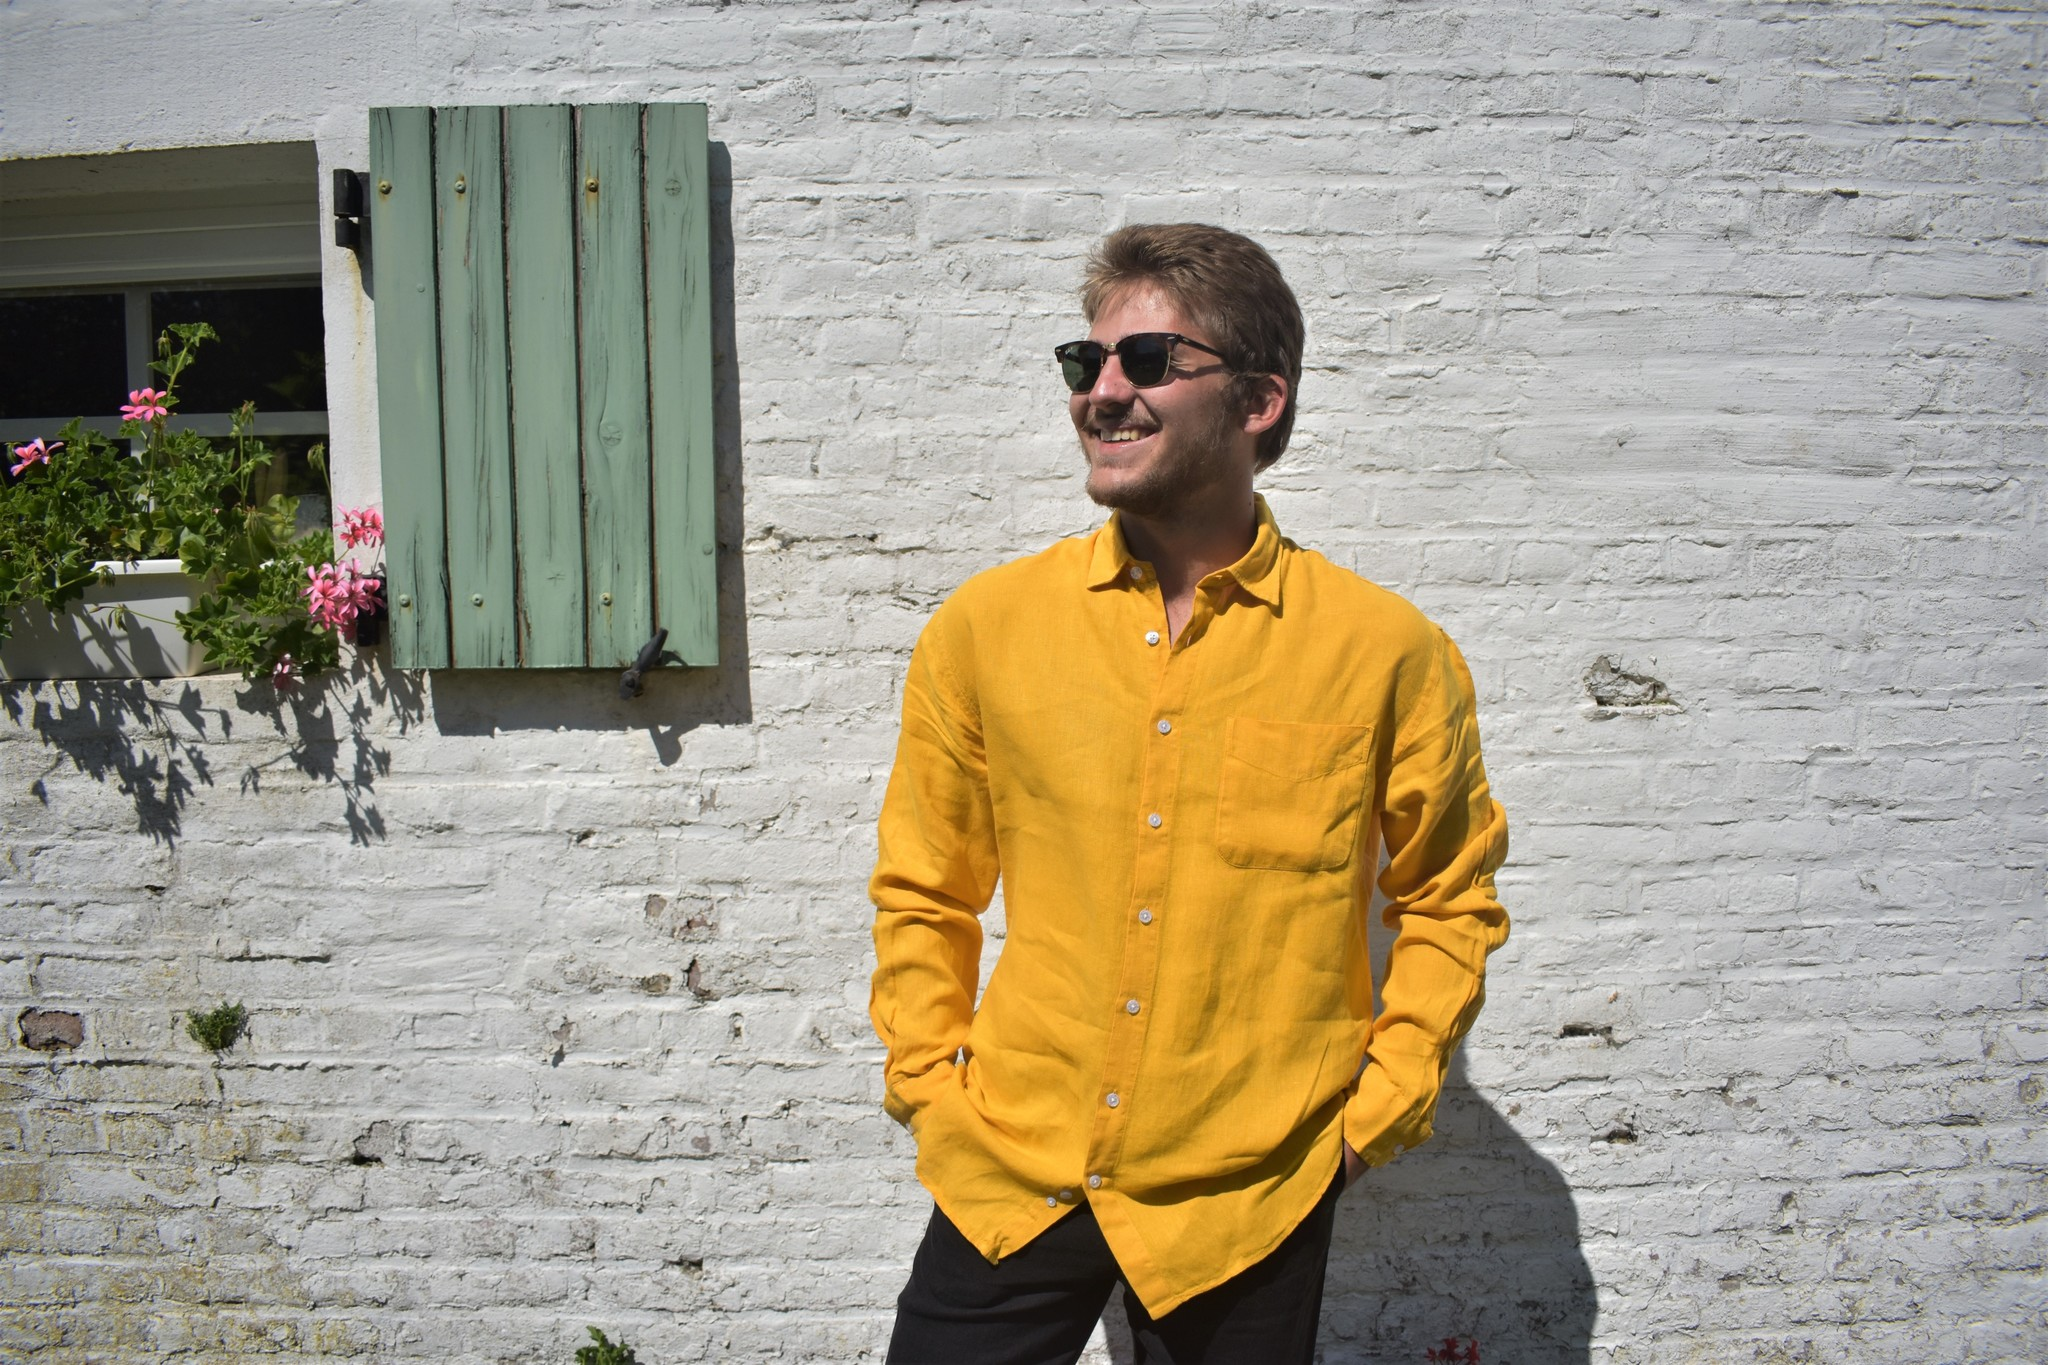 Le grenier du lin Yellow long-sleeved shirt